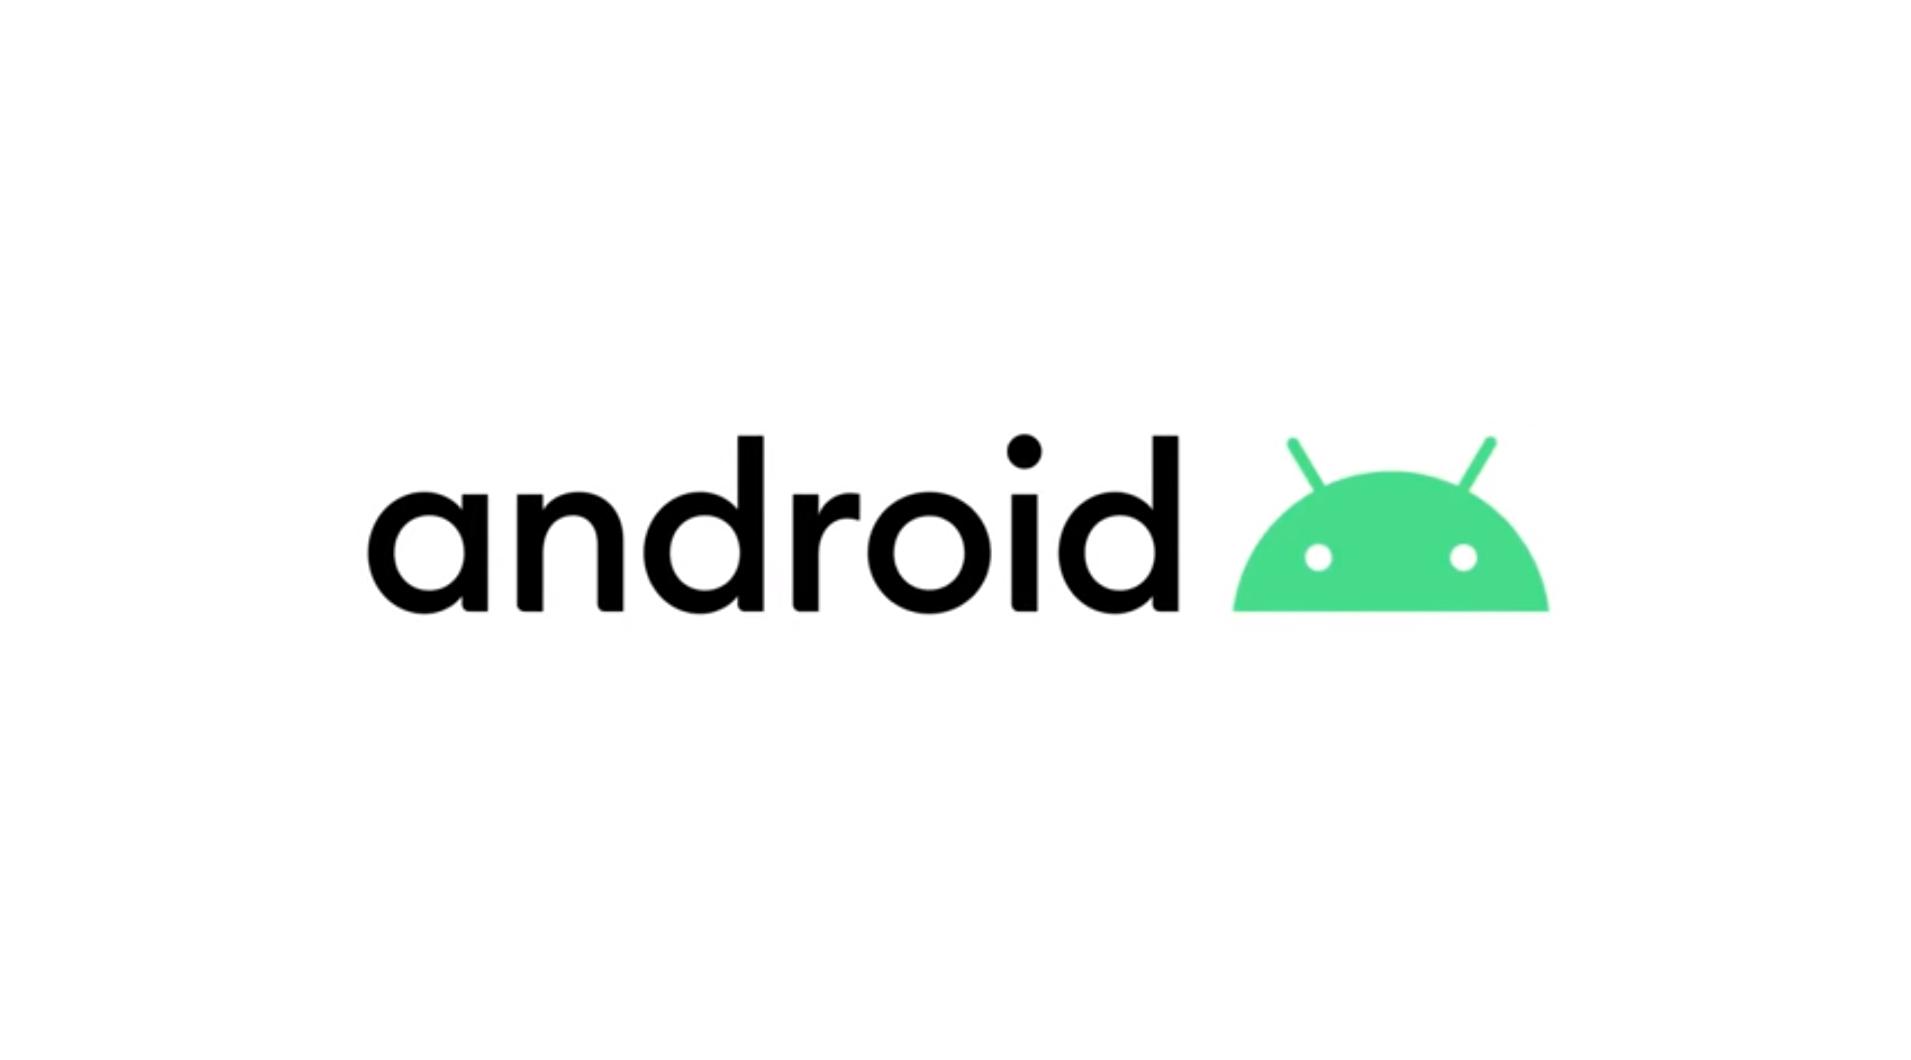 Resmen Android 10 olarak adlandırılan Android Q; Google Nixes Tatlı İsimler